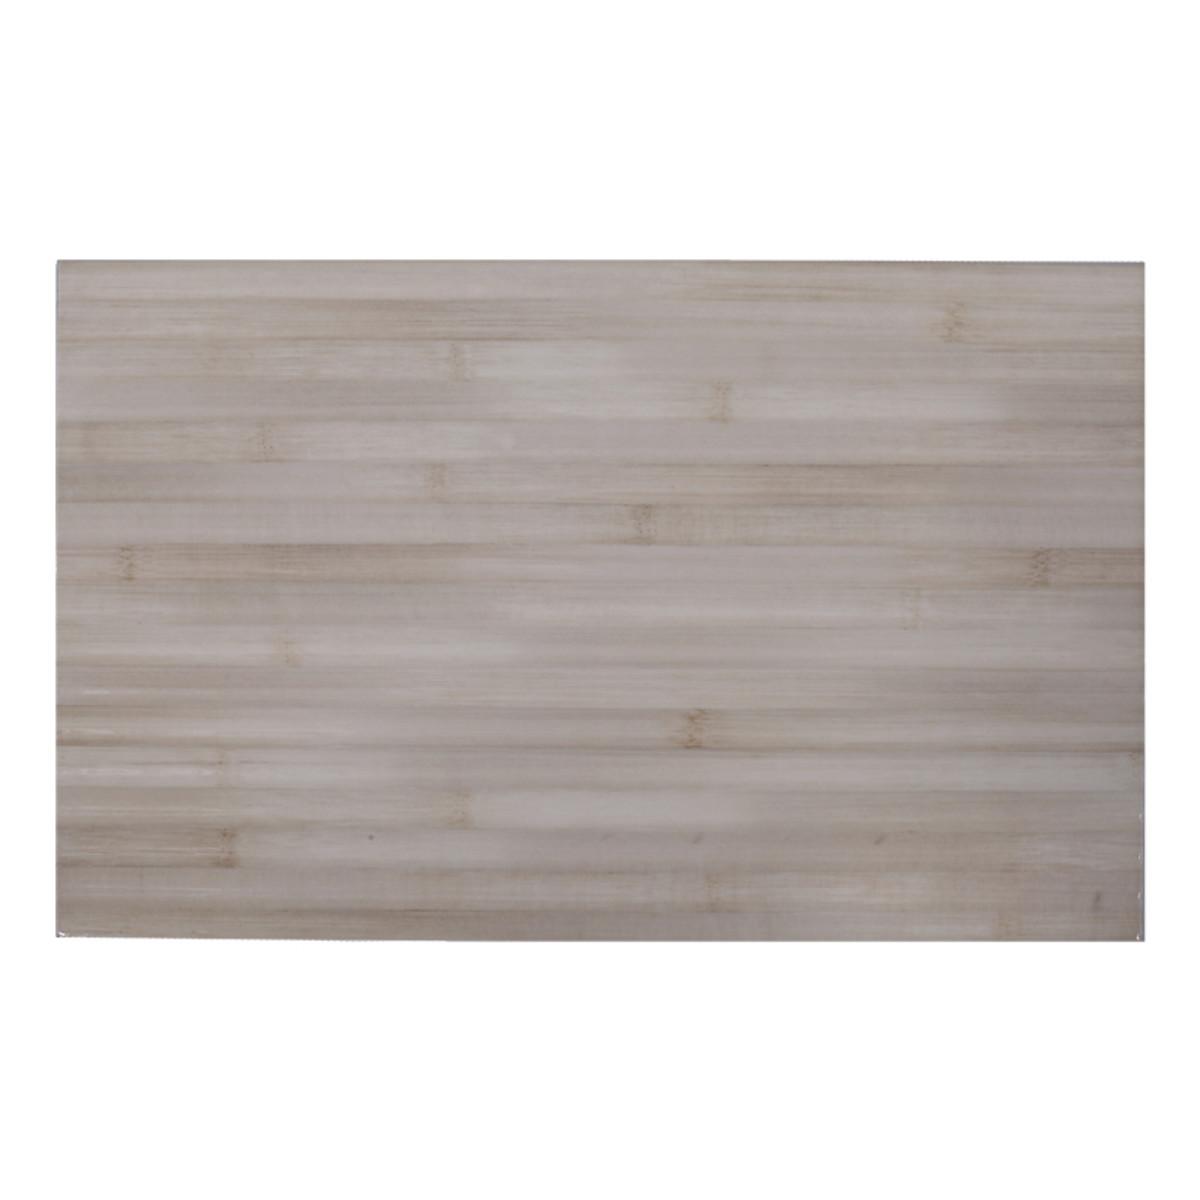 Плитка настенная Bamboo цвет бежевый 25х40 см 15 м2